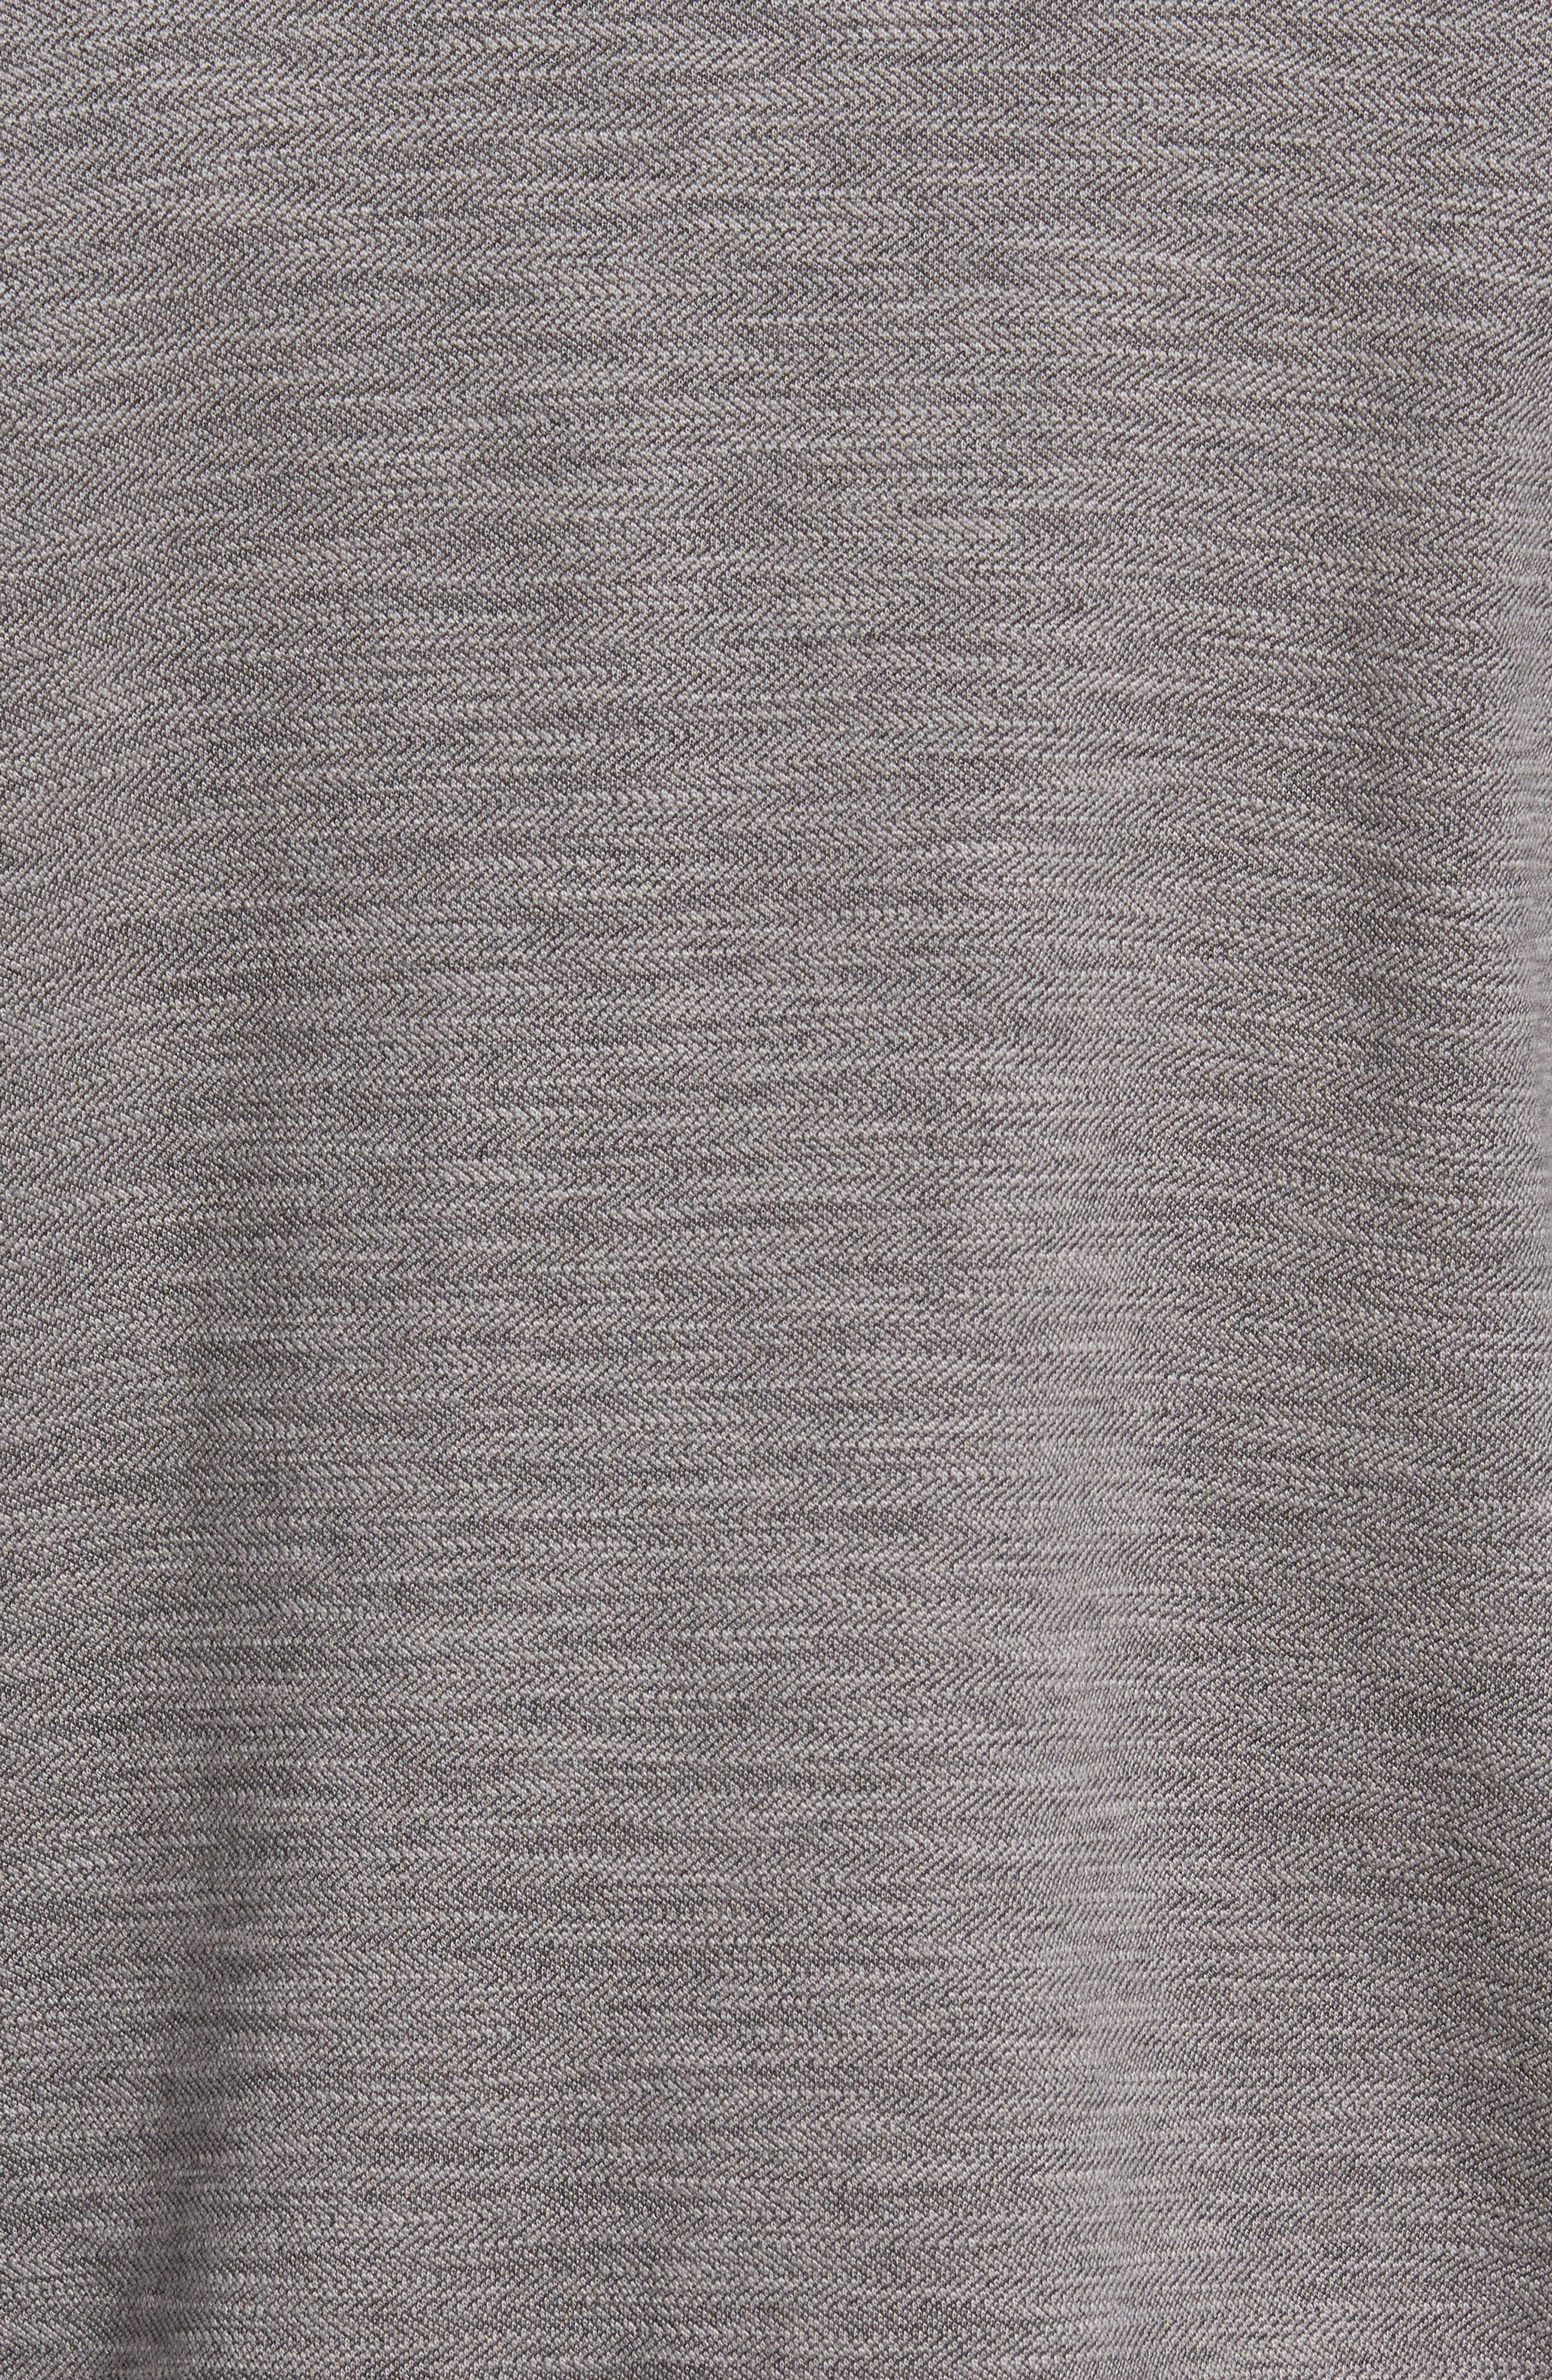 Sandbar Slub Reversible Quarter Zip Pullover,                             Alternate thumbnail 21, color,